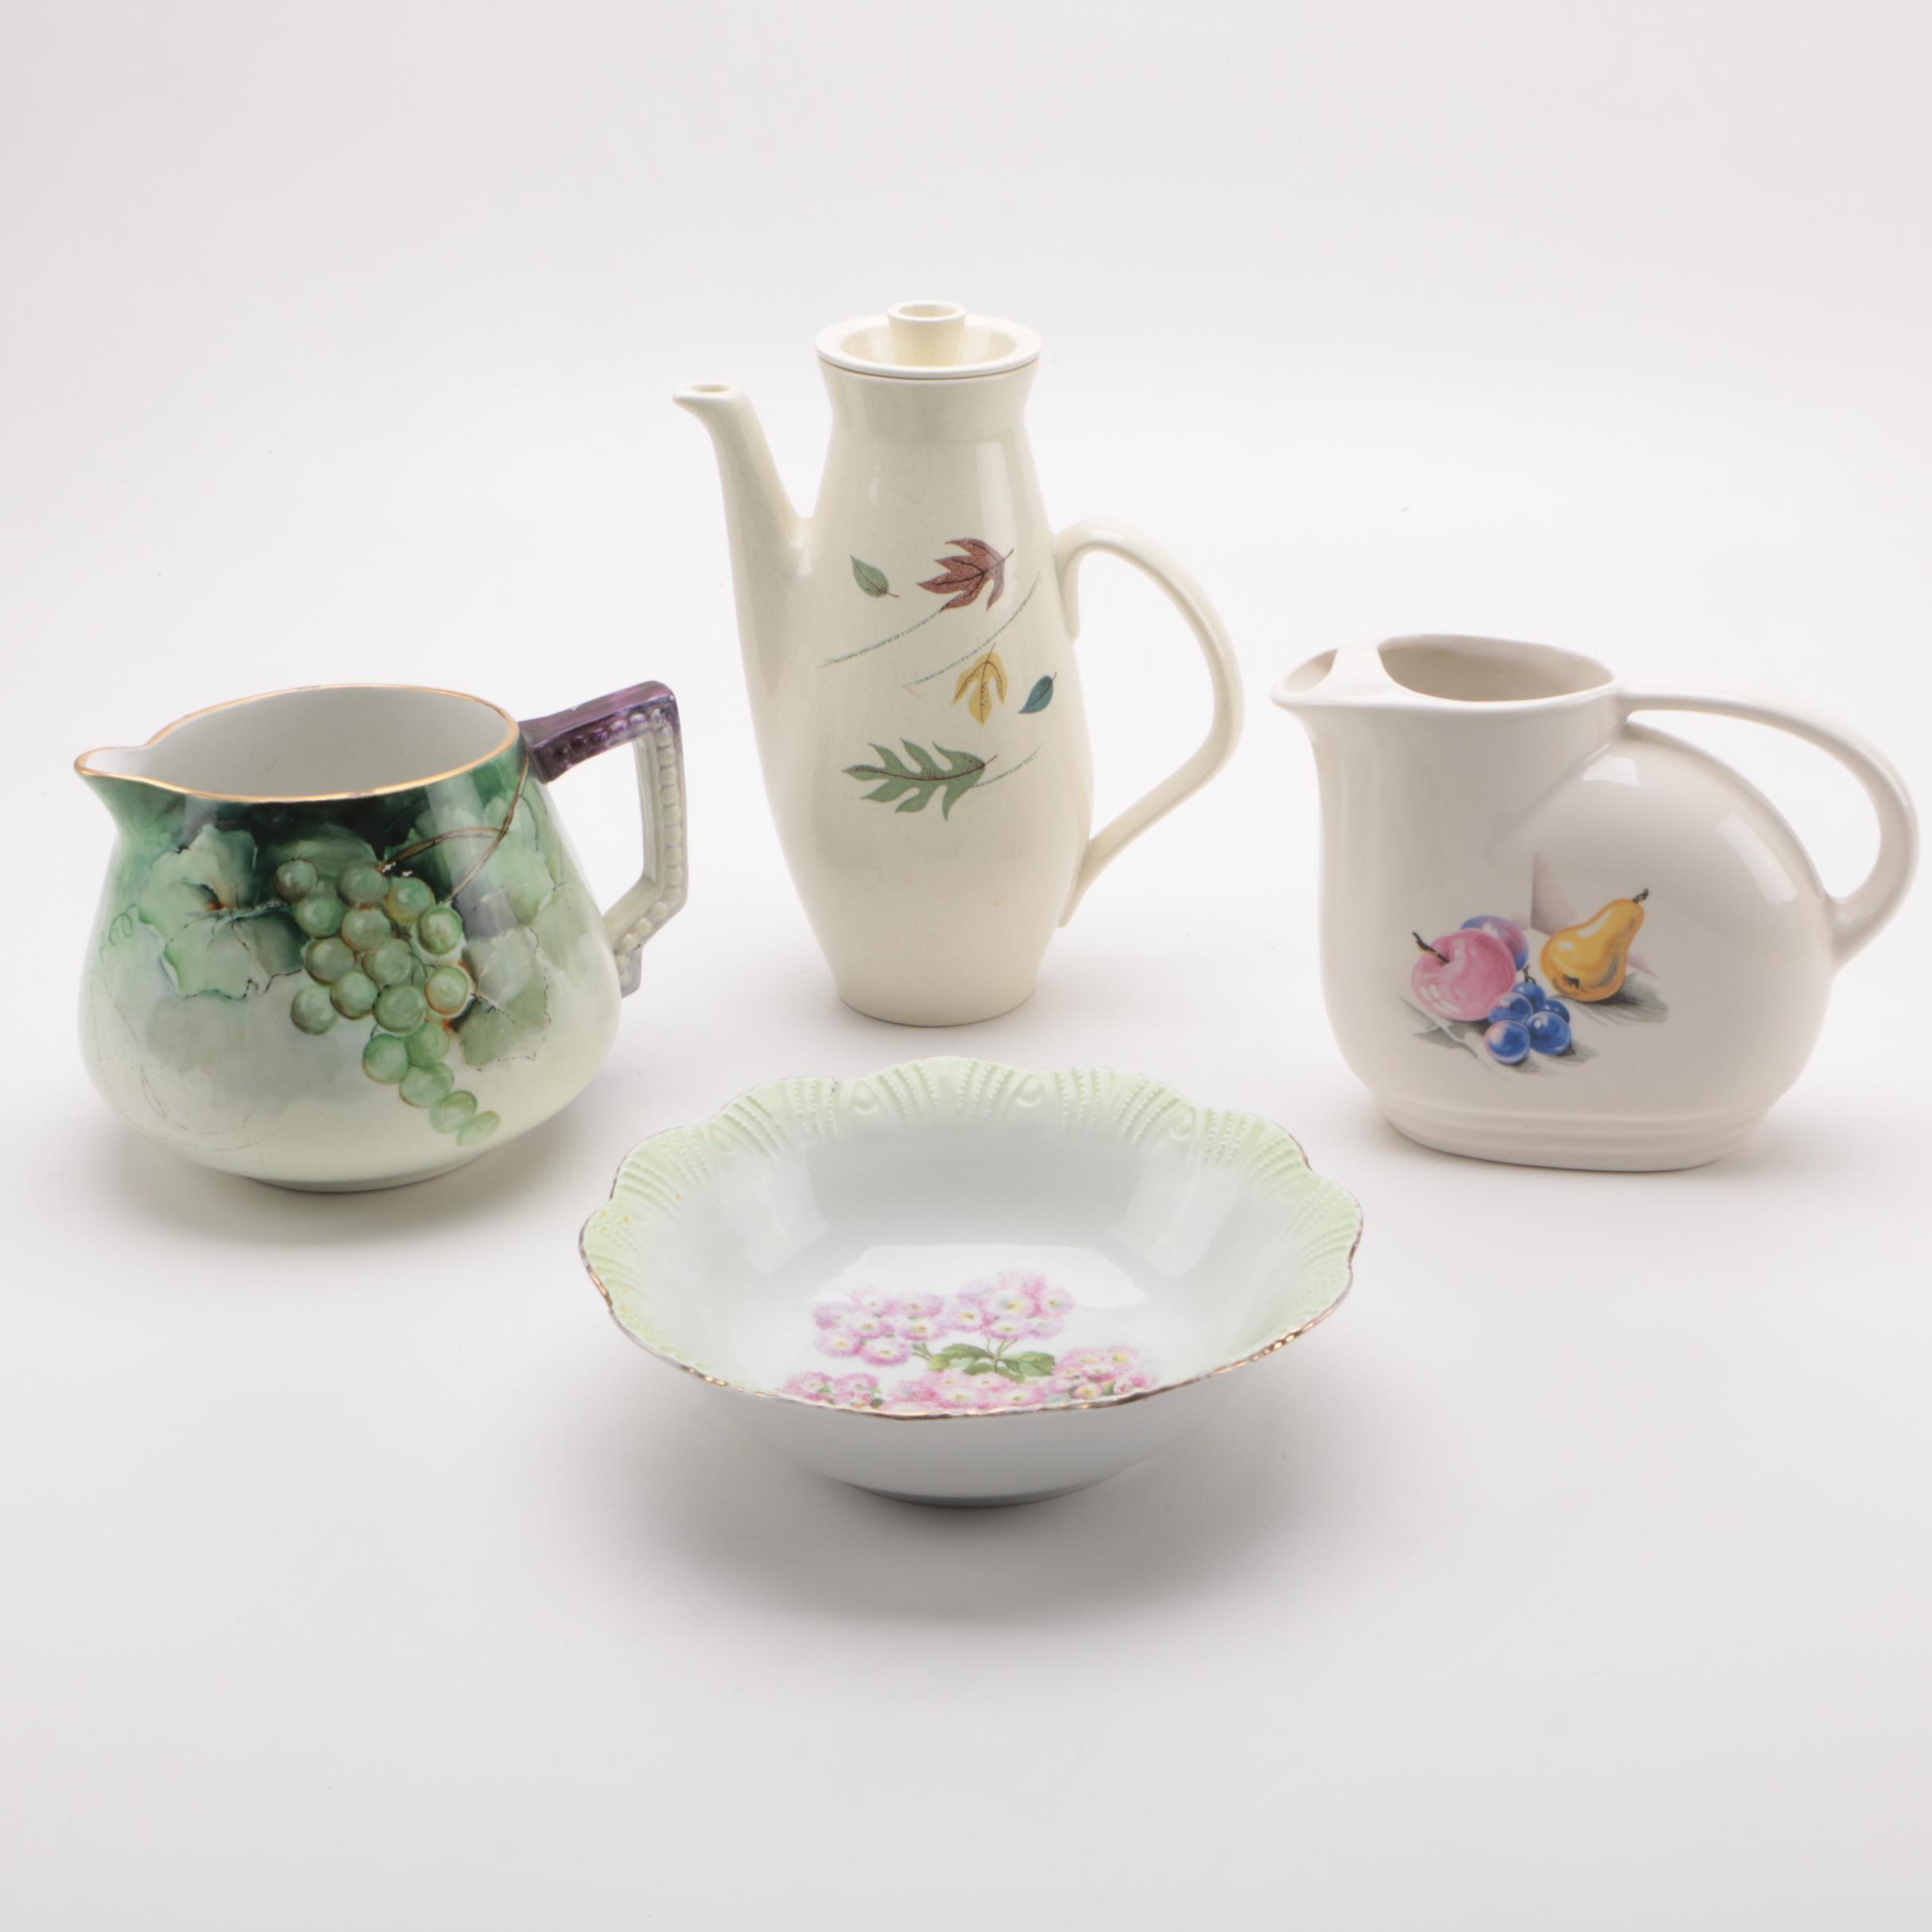 Ceramic Serveware Featuring Franciscan